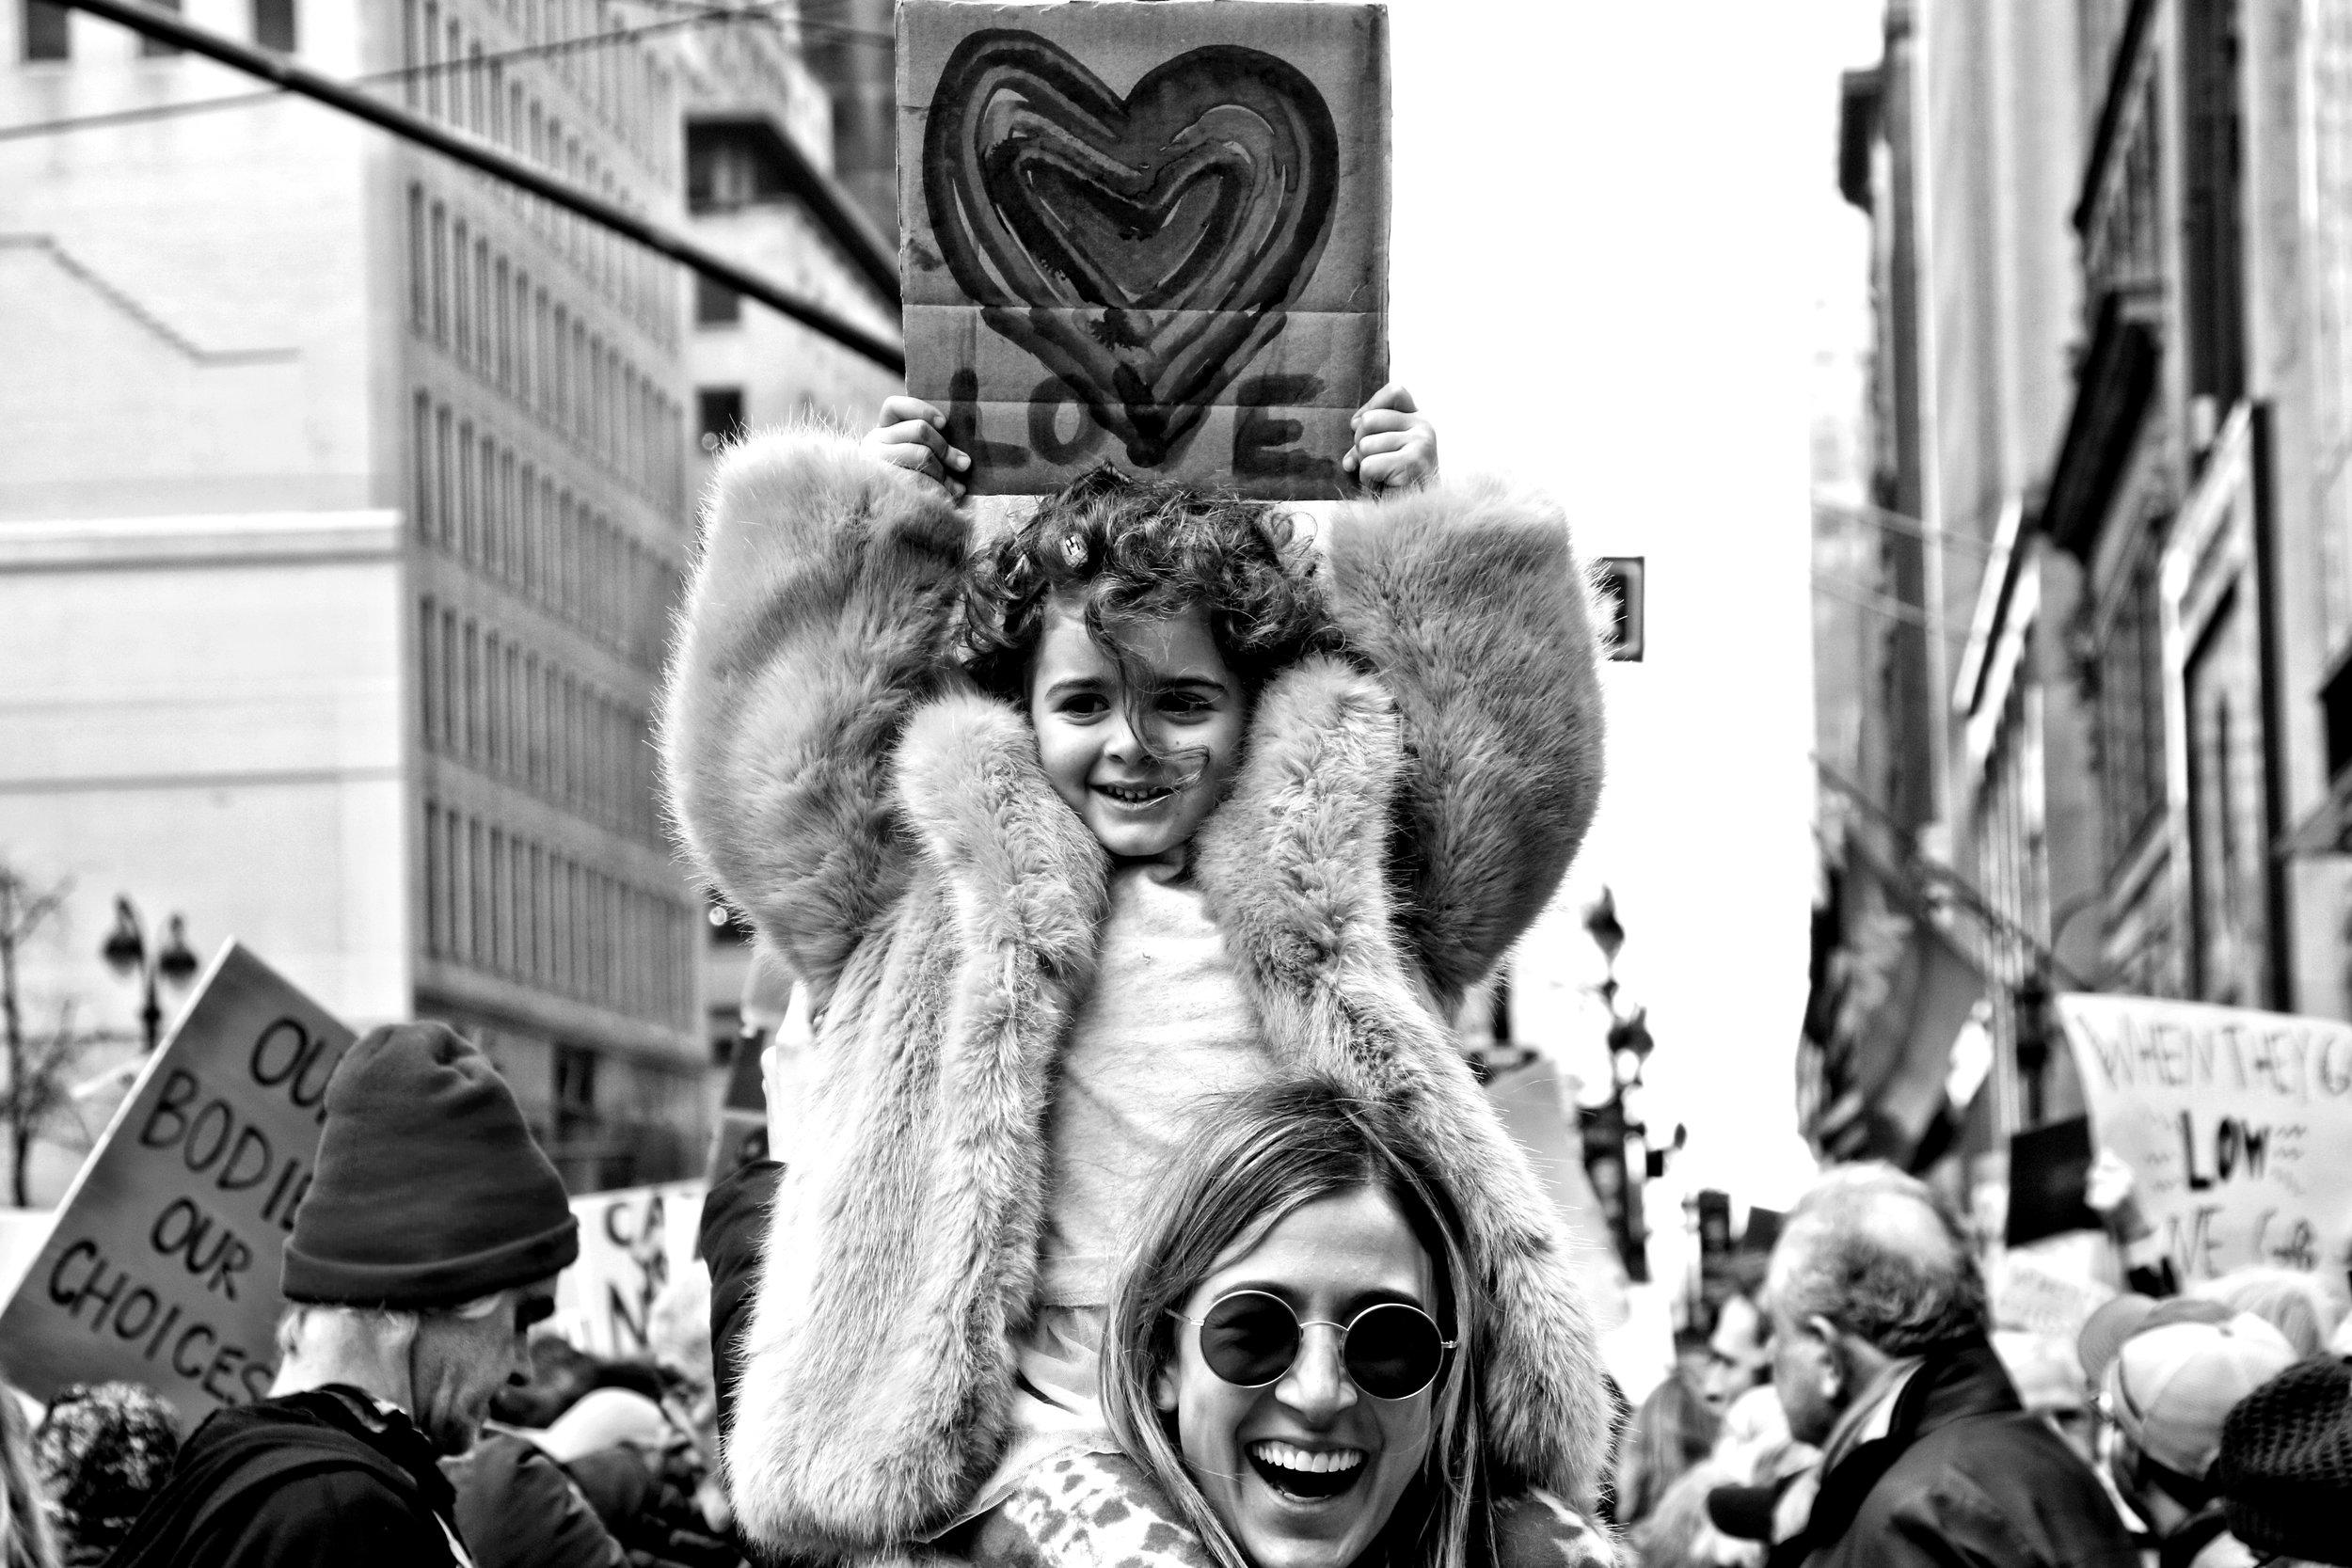 Women's March, New York City, January 21st, 2017